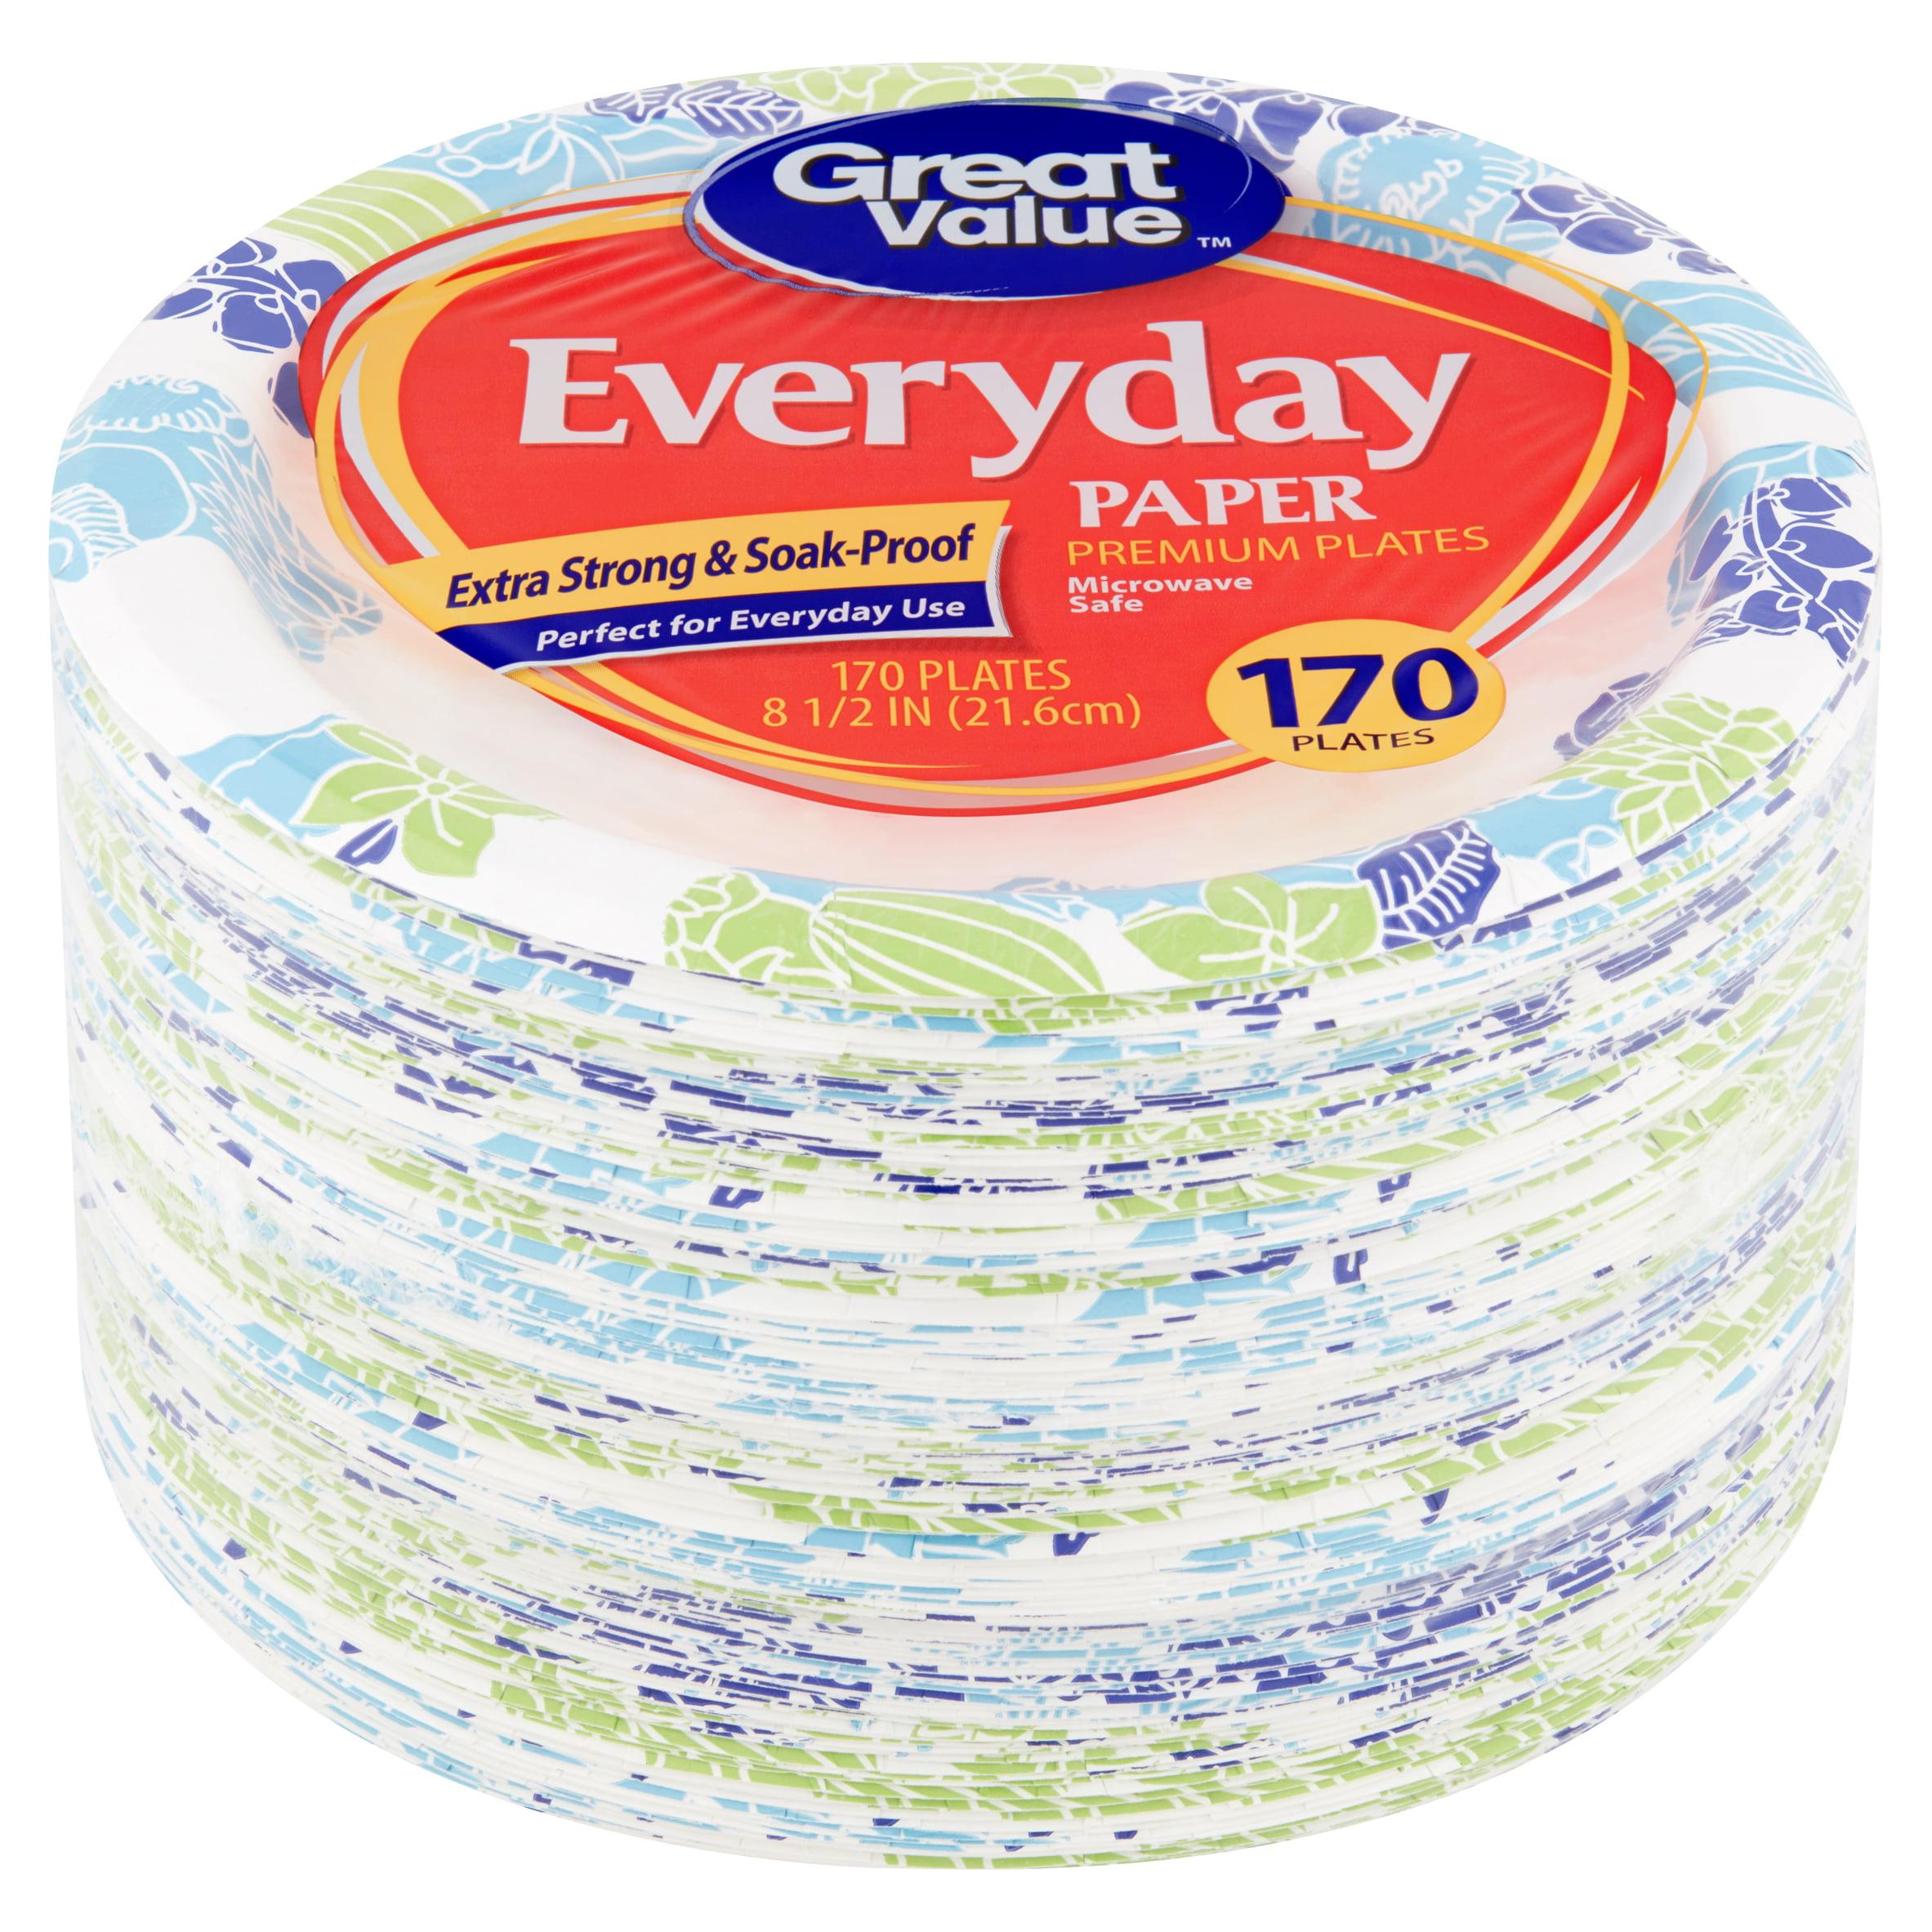 "Great Value Everyday Premium Paper Plates, 8 5/8"", 170 Count"